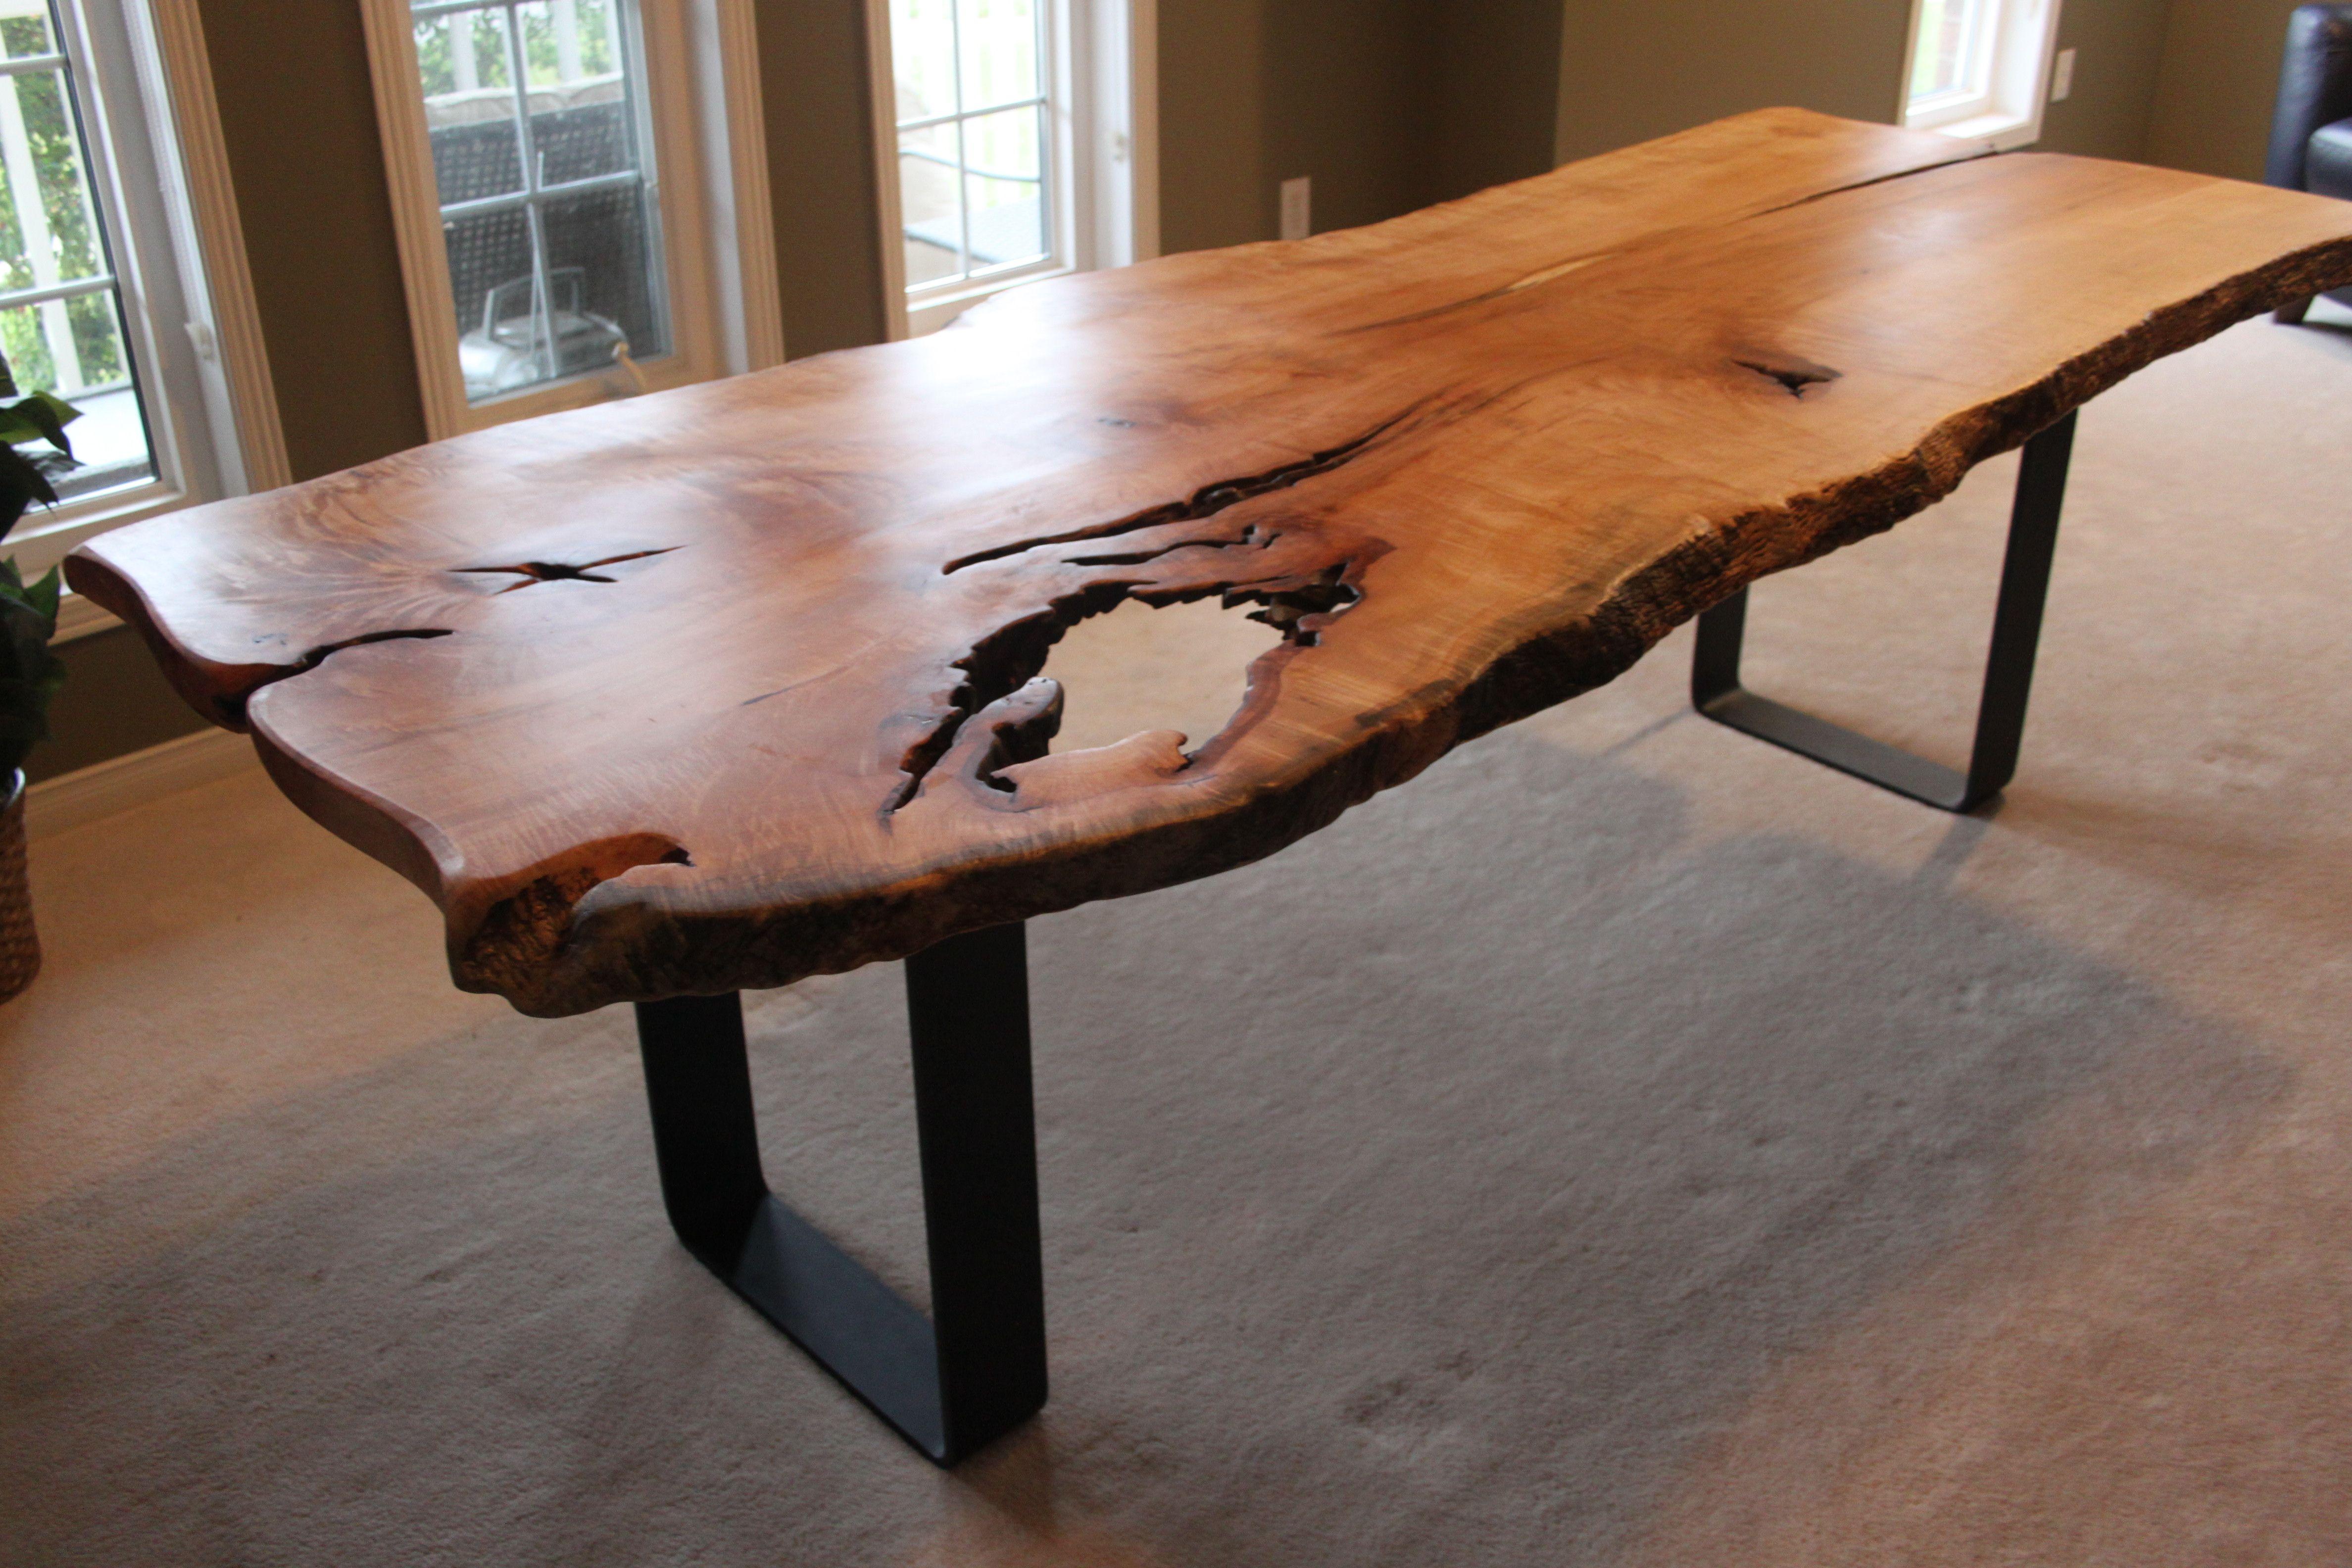 table liveedge edge walnut giant grant black diningtable dining bjorling live